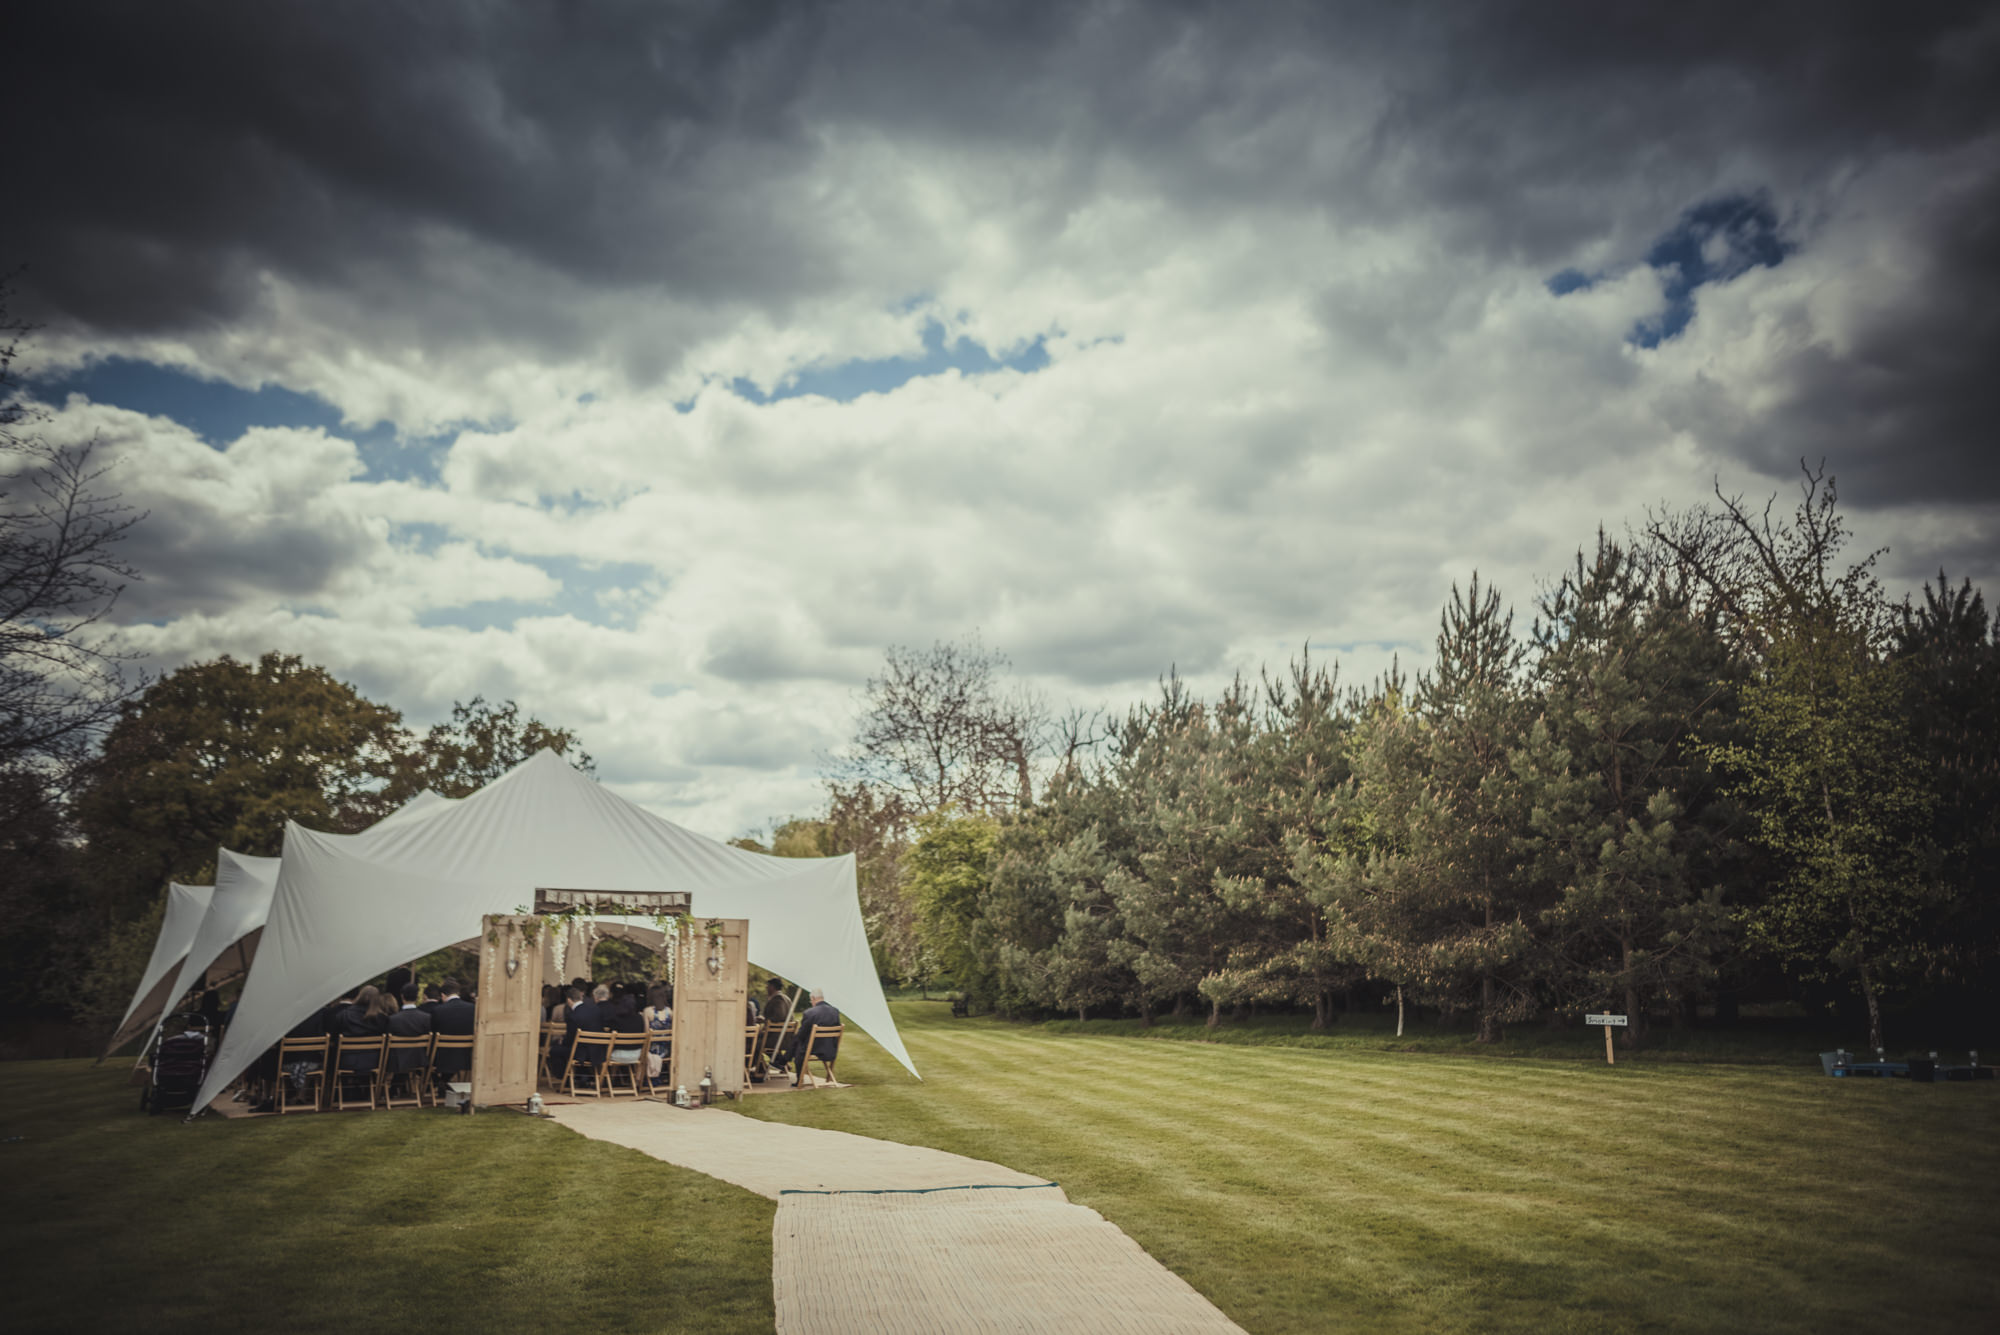 Jacqueline-Gareth-Wedding-Westmead-Events-Surrey-Manu-Mendoza-Wedding-Photography-175.jpg